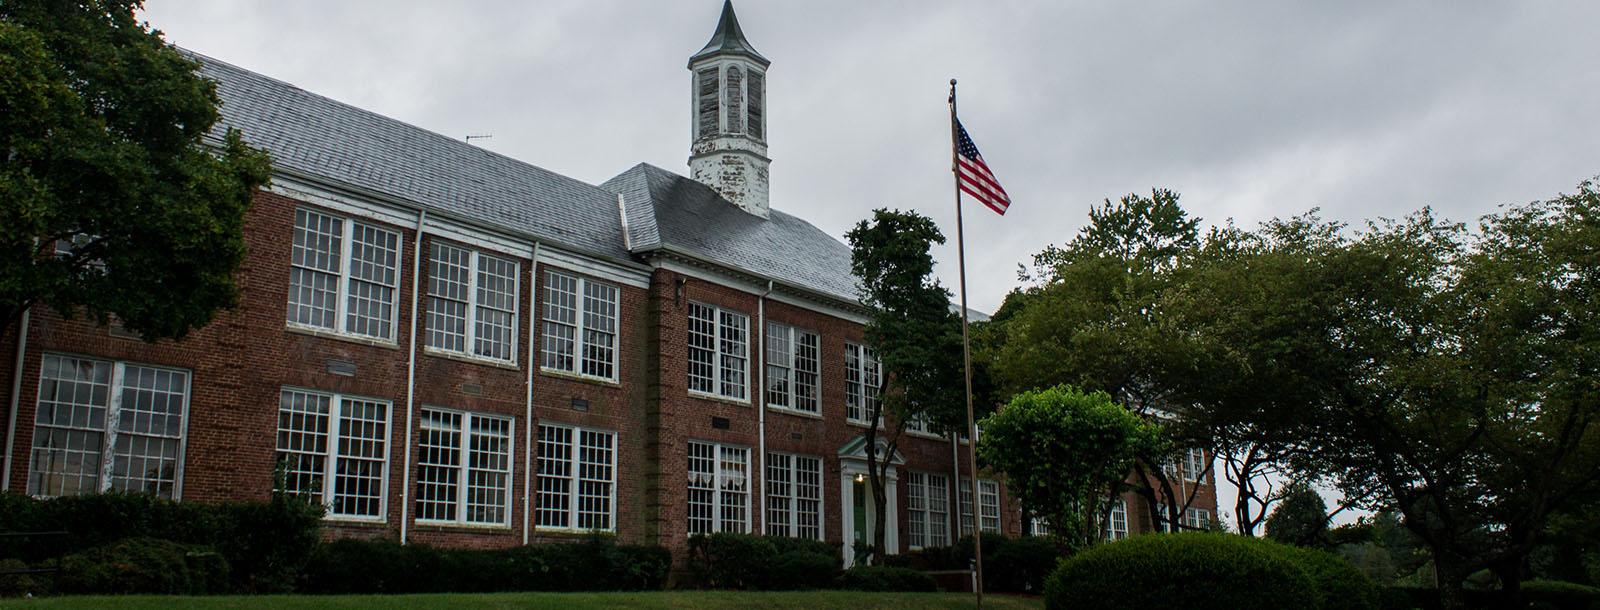 Old-Mount-Vernon-High-School